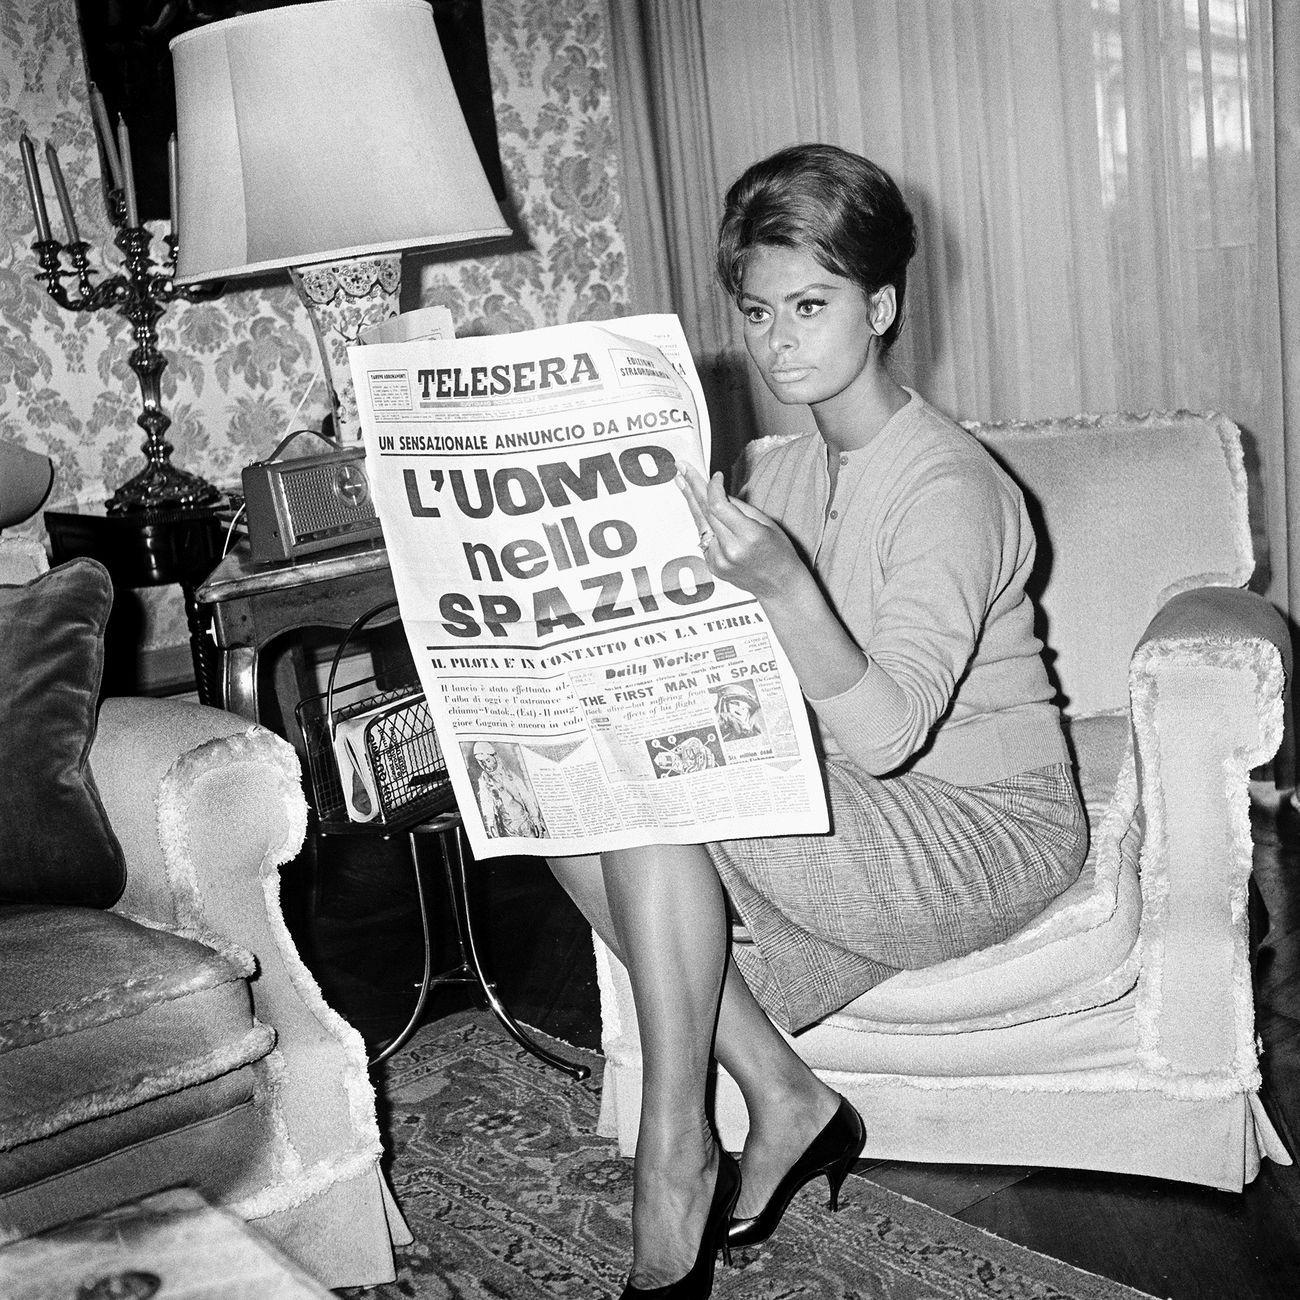 Sophia Loren legge di Gagarin, 1961. Photo Archivio Luce